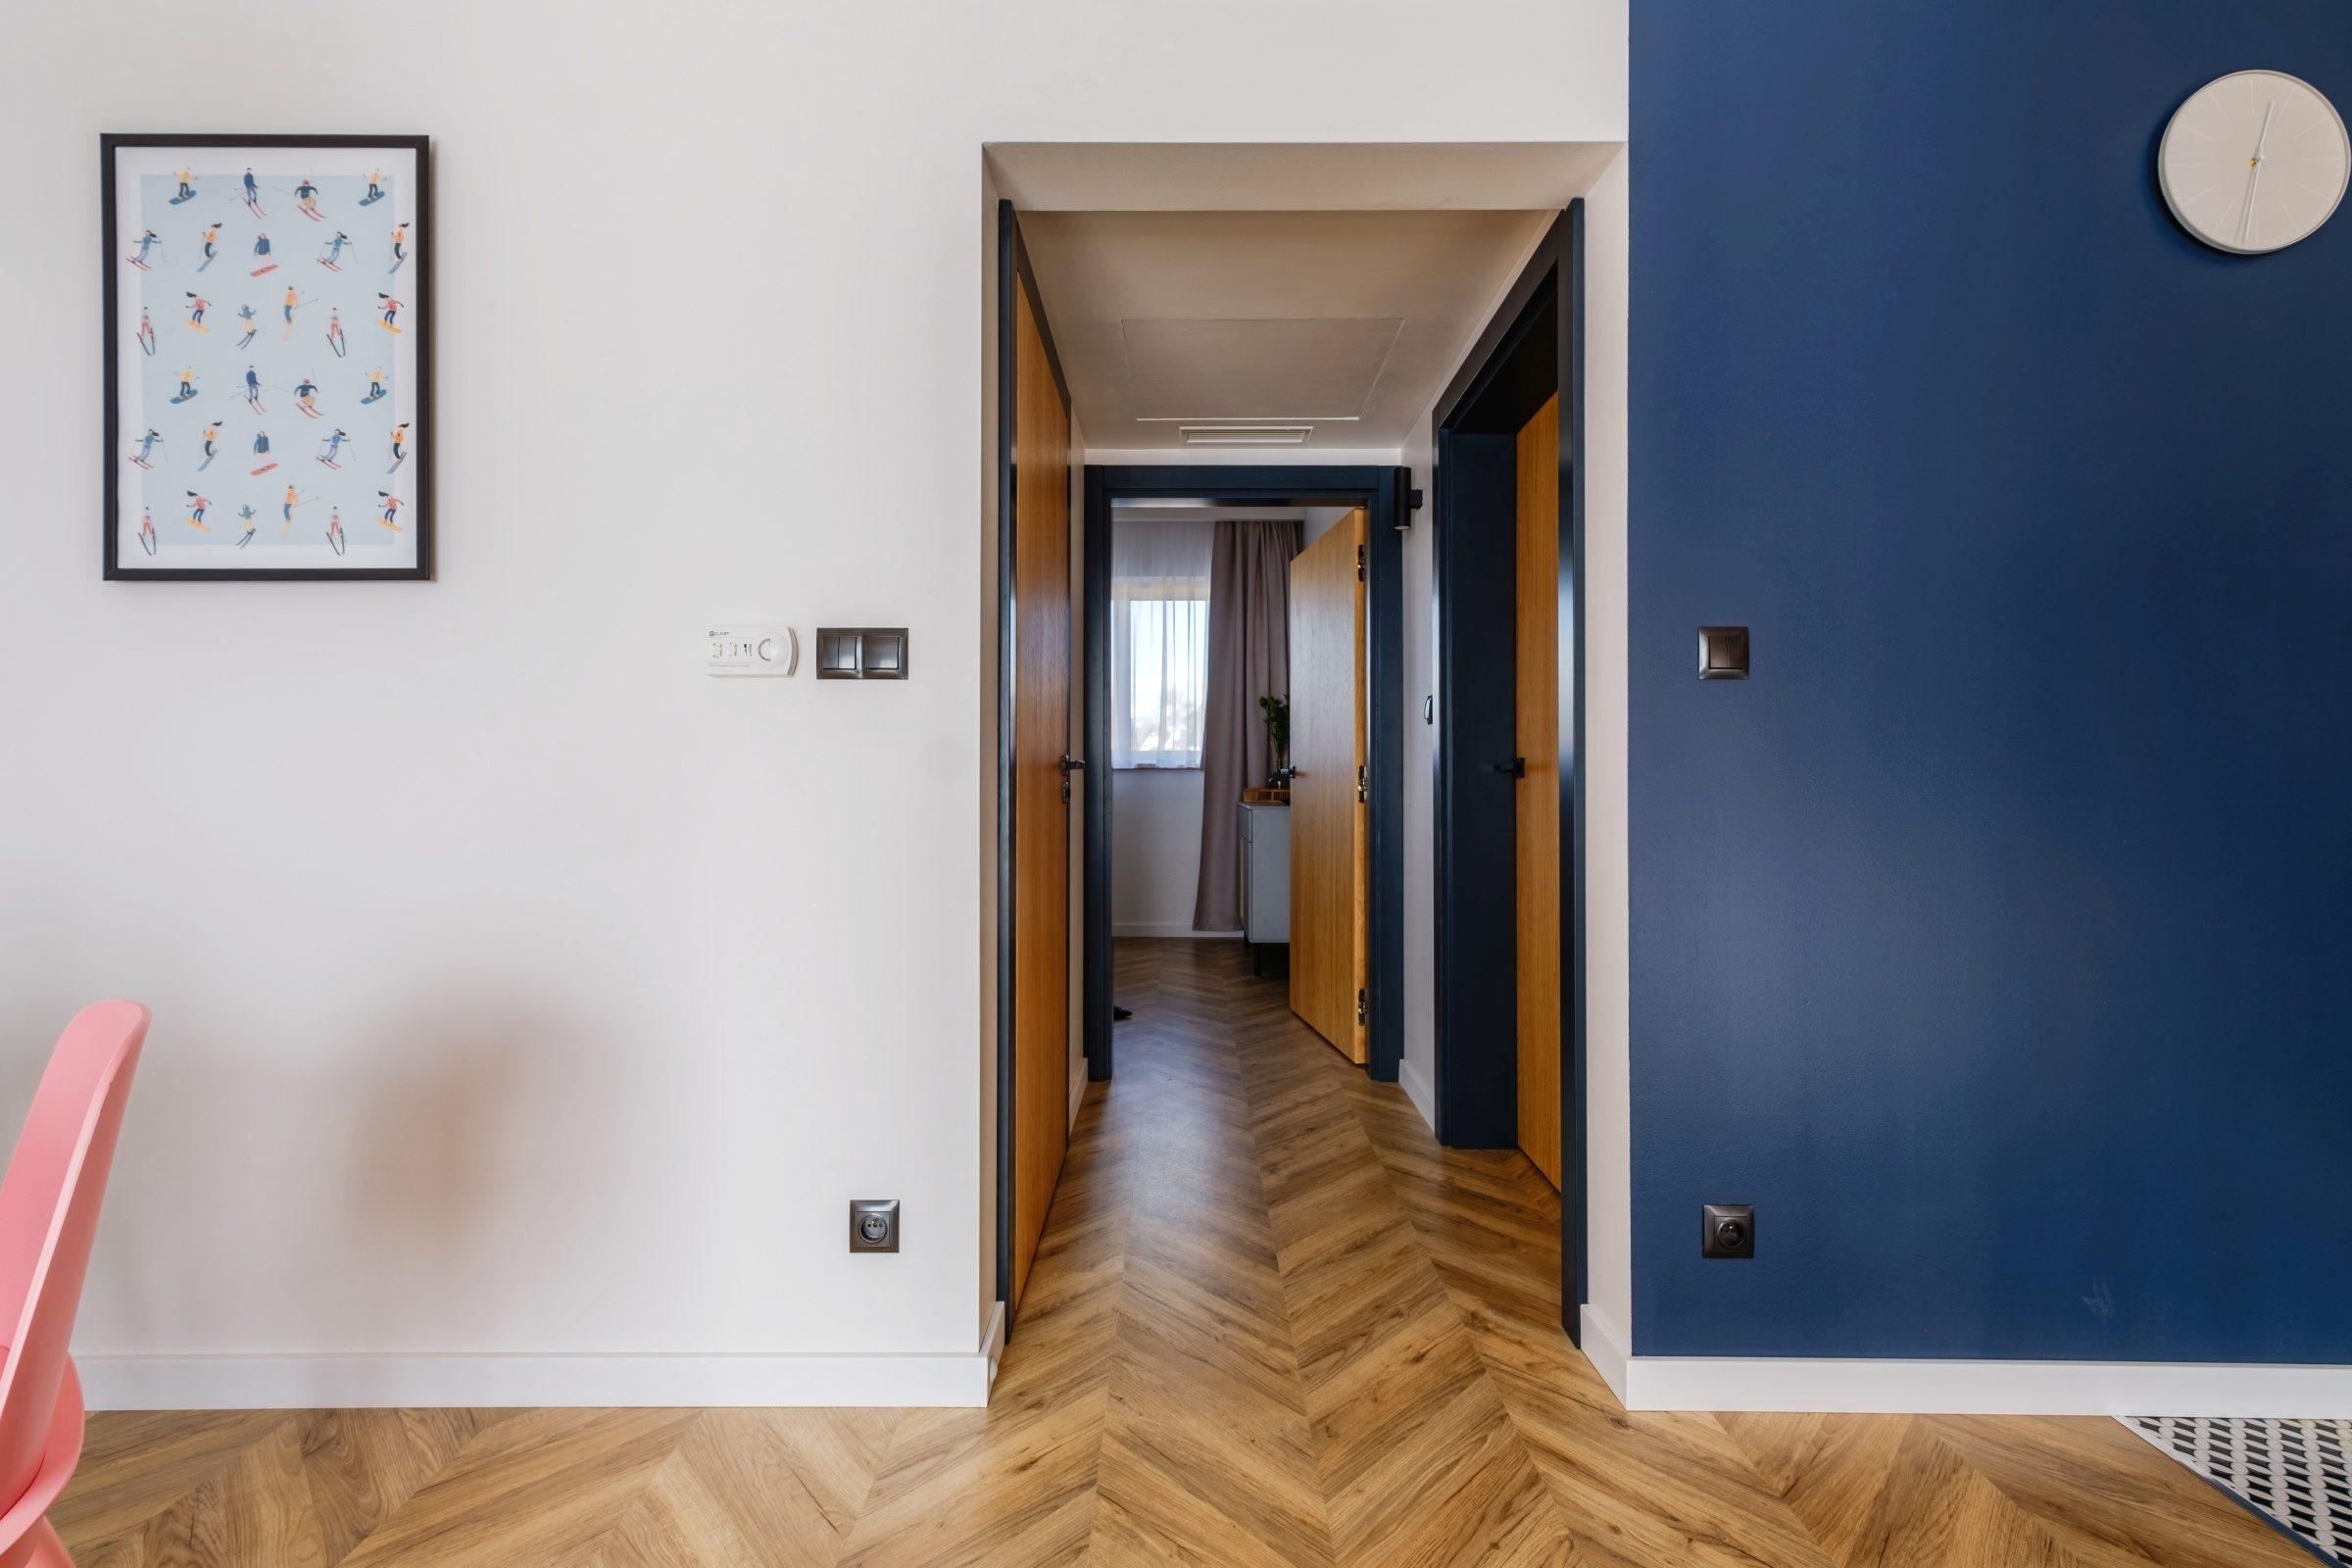 Apartamenty NOVA BIAŁKA Białka Tatrzańska apartament 6 salon 5